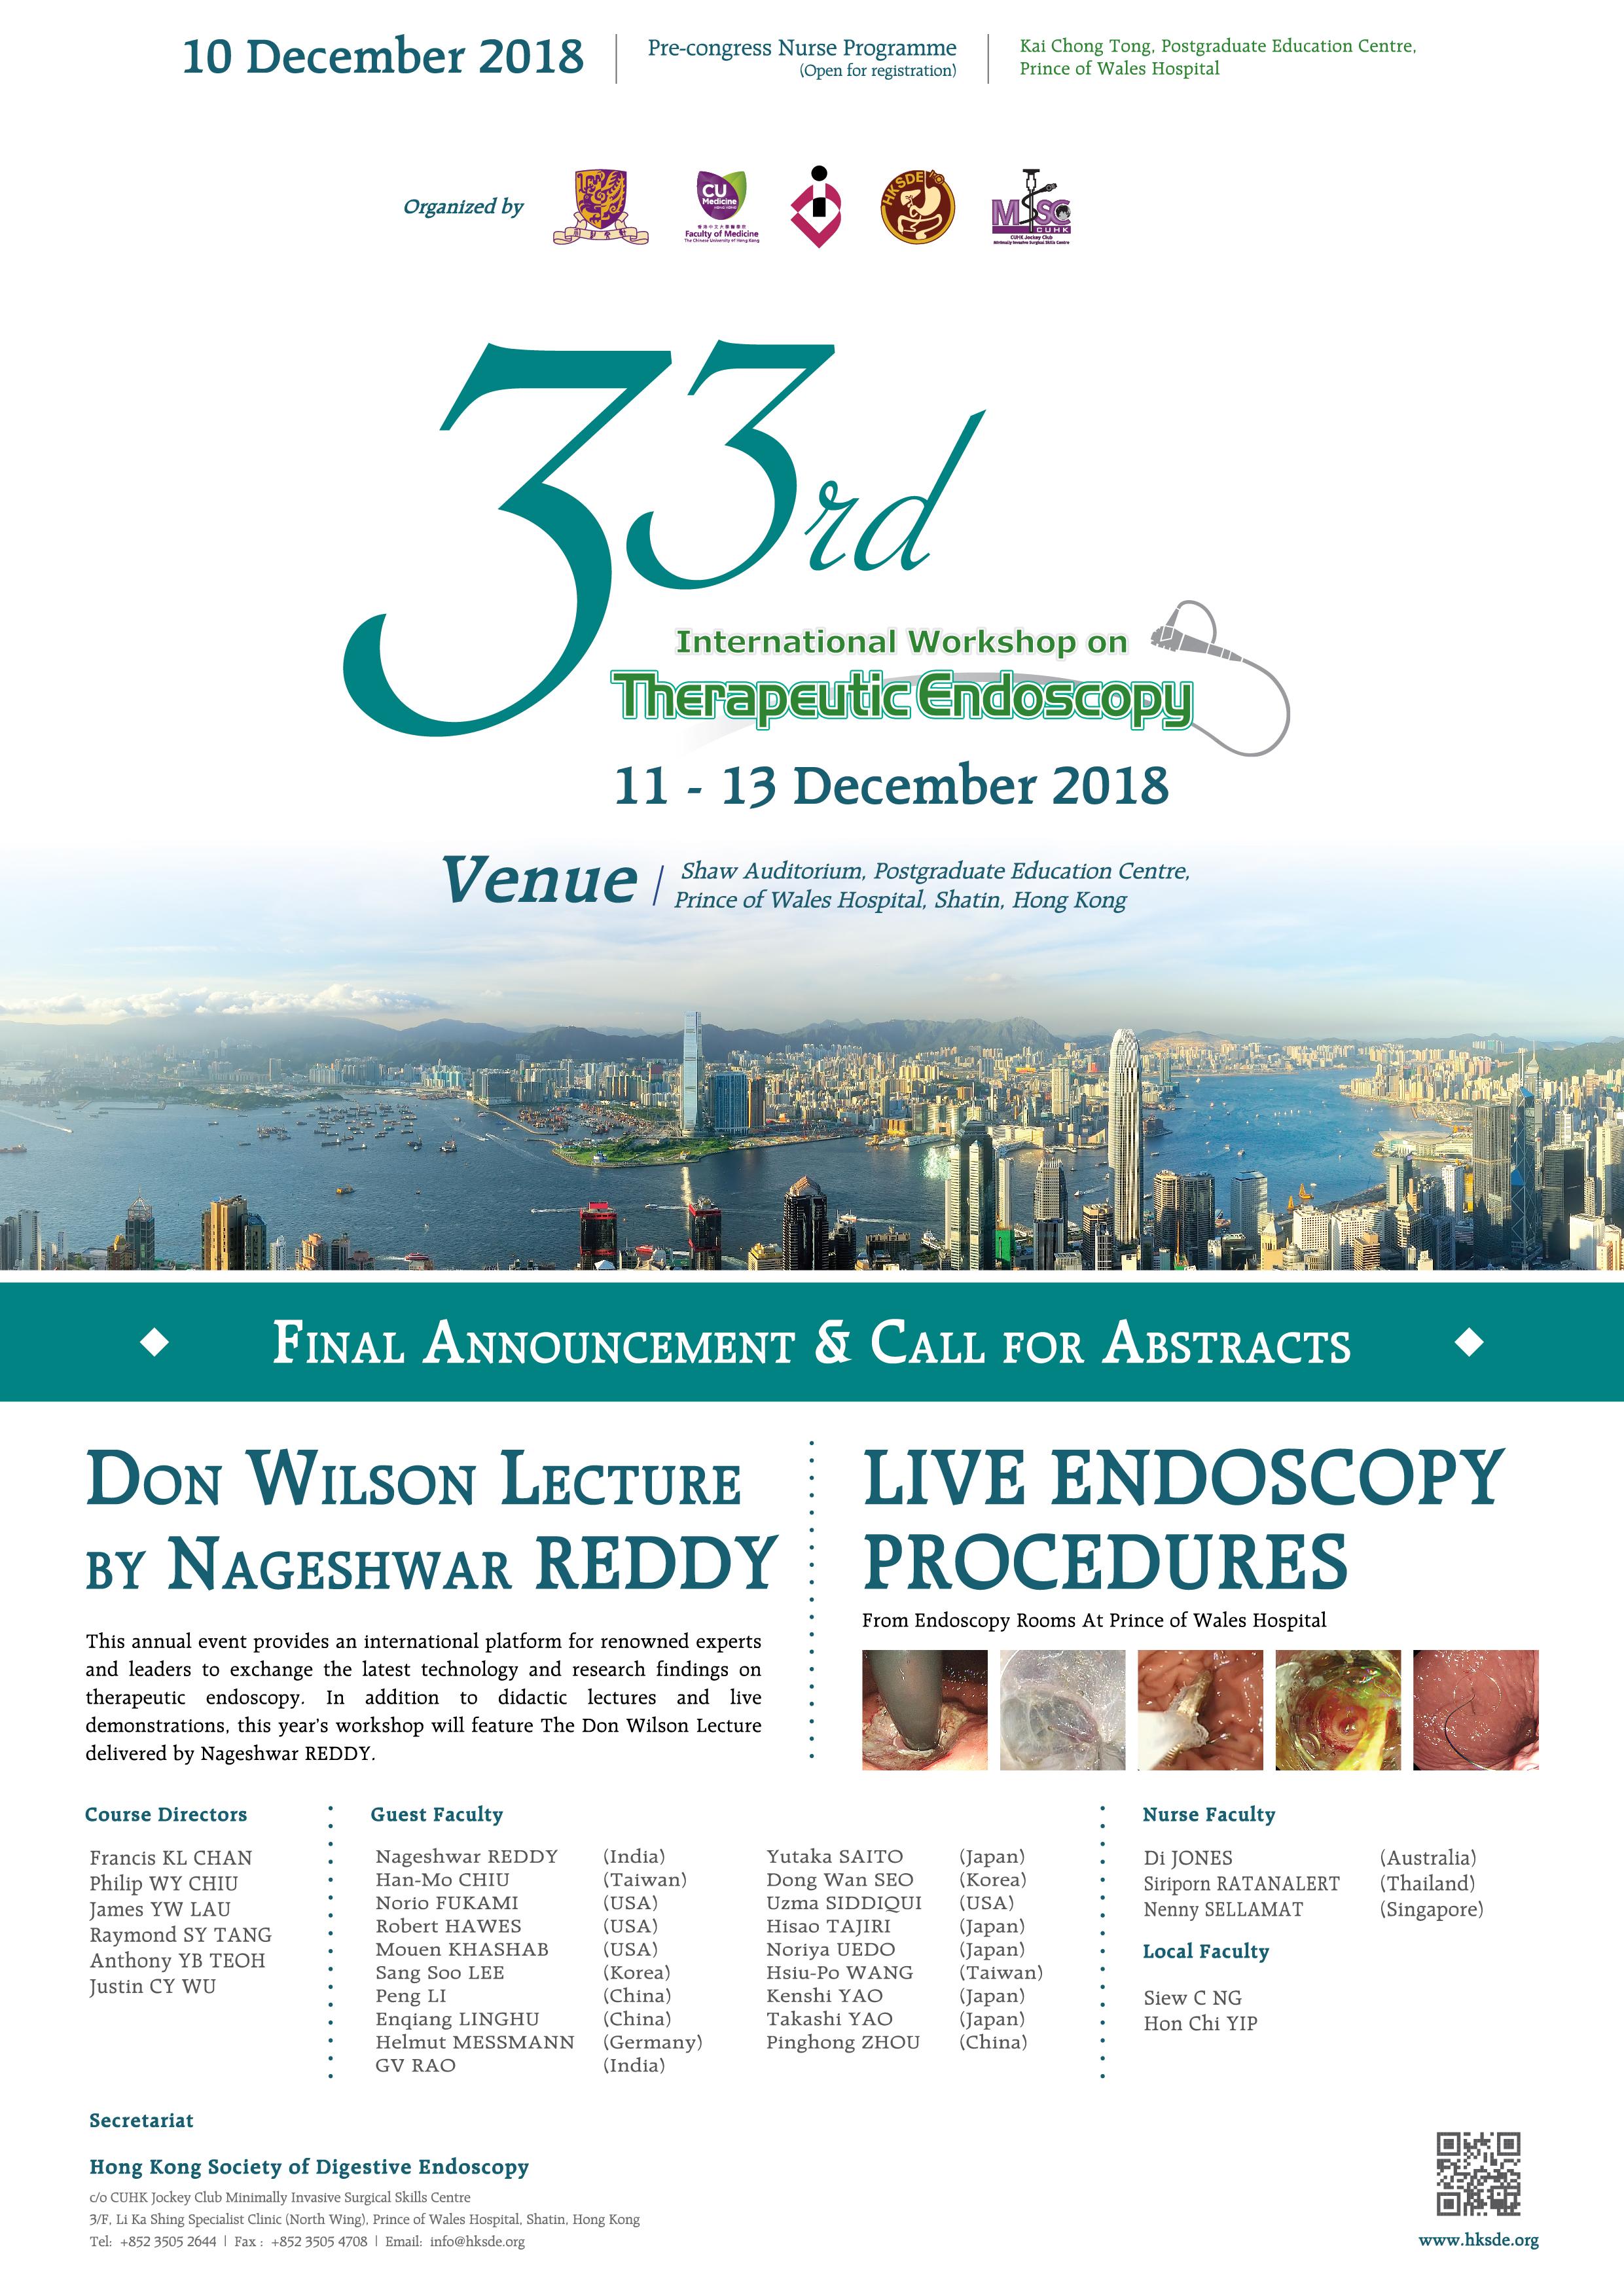 Endoscope Design: 33rd International Workshop On Therapeutic Endoscopy